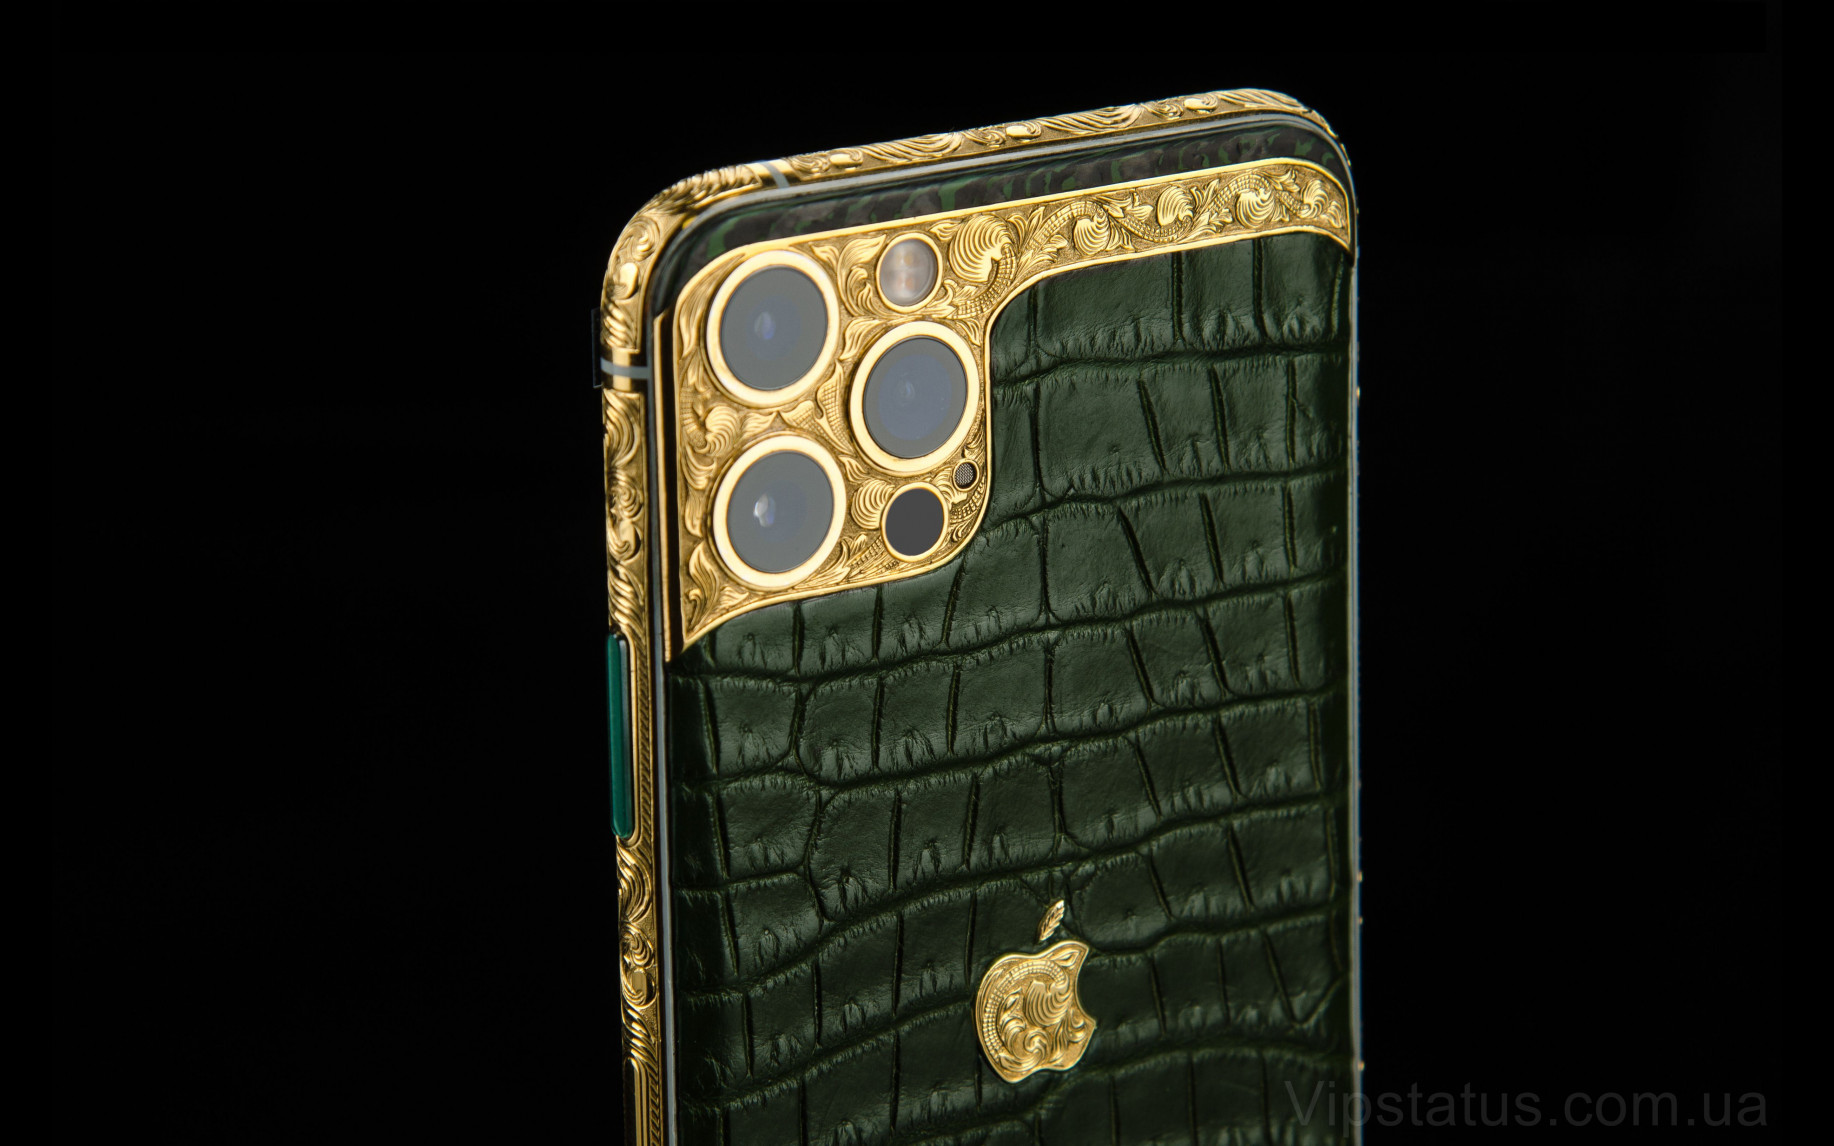 Elite Eastern Emerald IPHONE 12 PRO MAX 512 GB Eastern Emerald IPHONE 12 PRO MAX 512 GB image 2